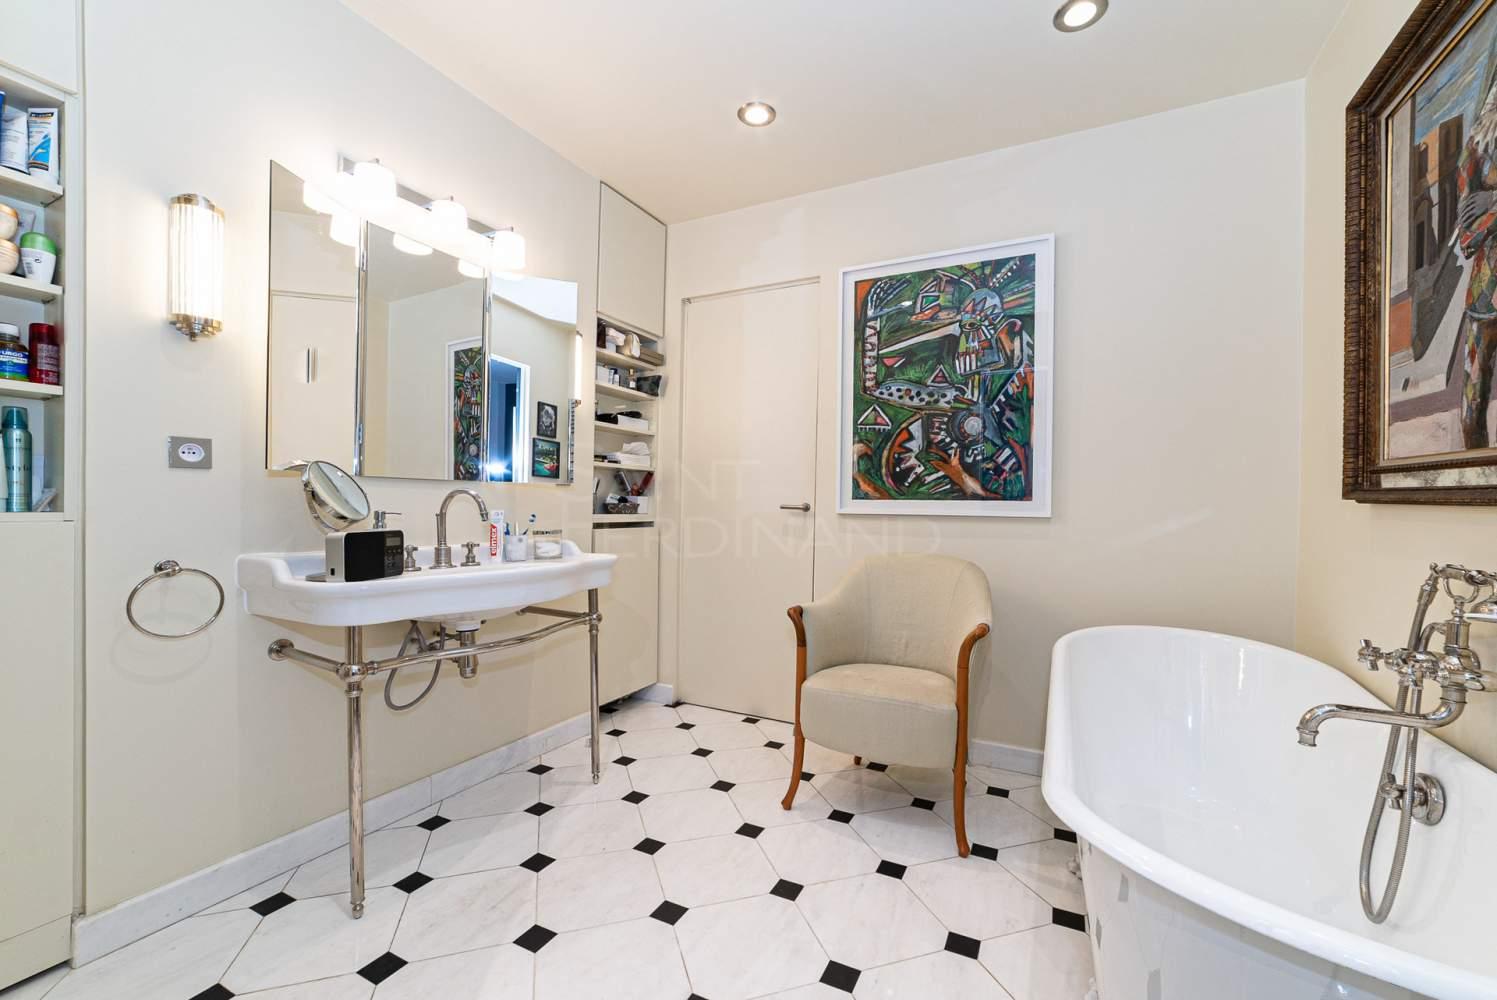 Neuilly-sur-Seine  - Appartement 5 Pièces 2 Chambres - picture 8